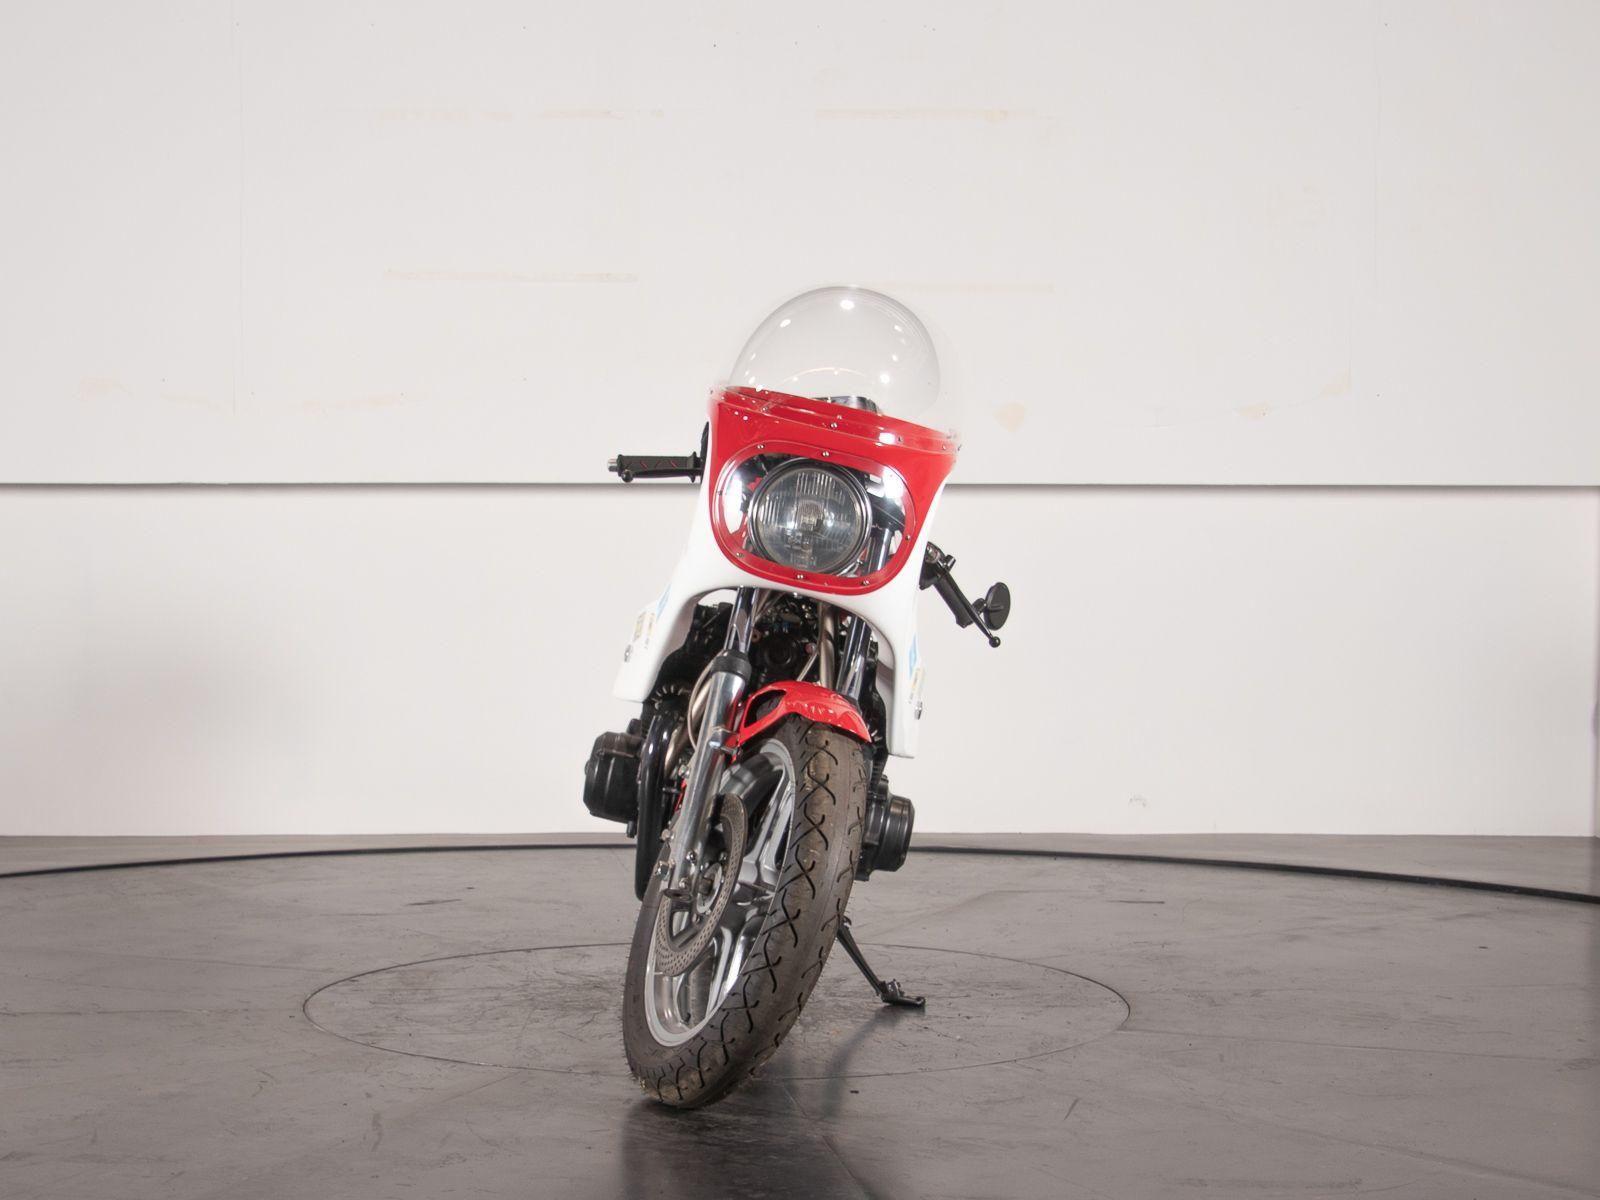 1984 Kawasaki Segoni 750 46341